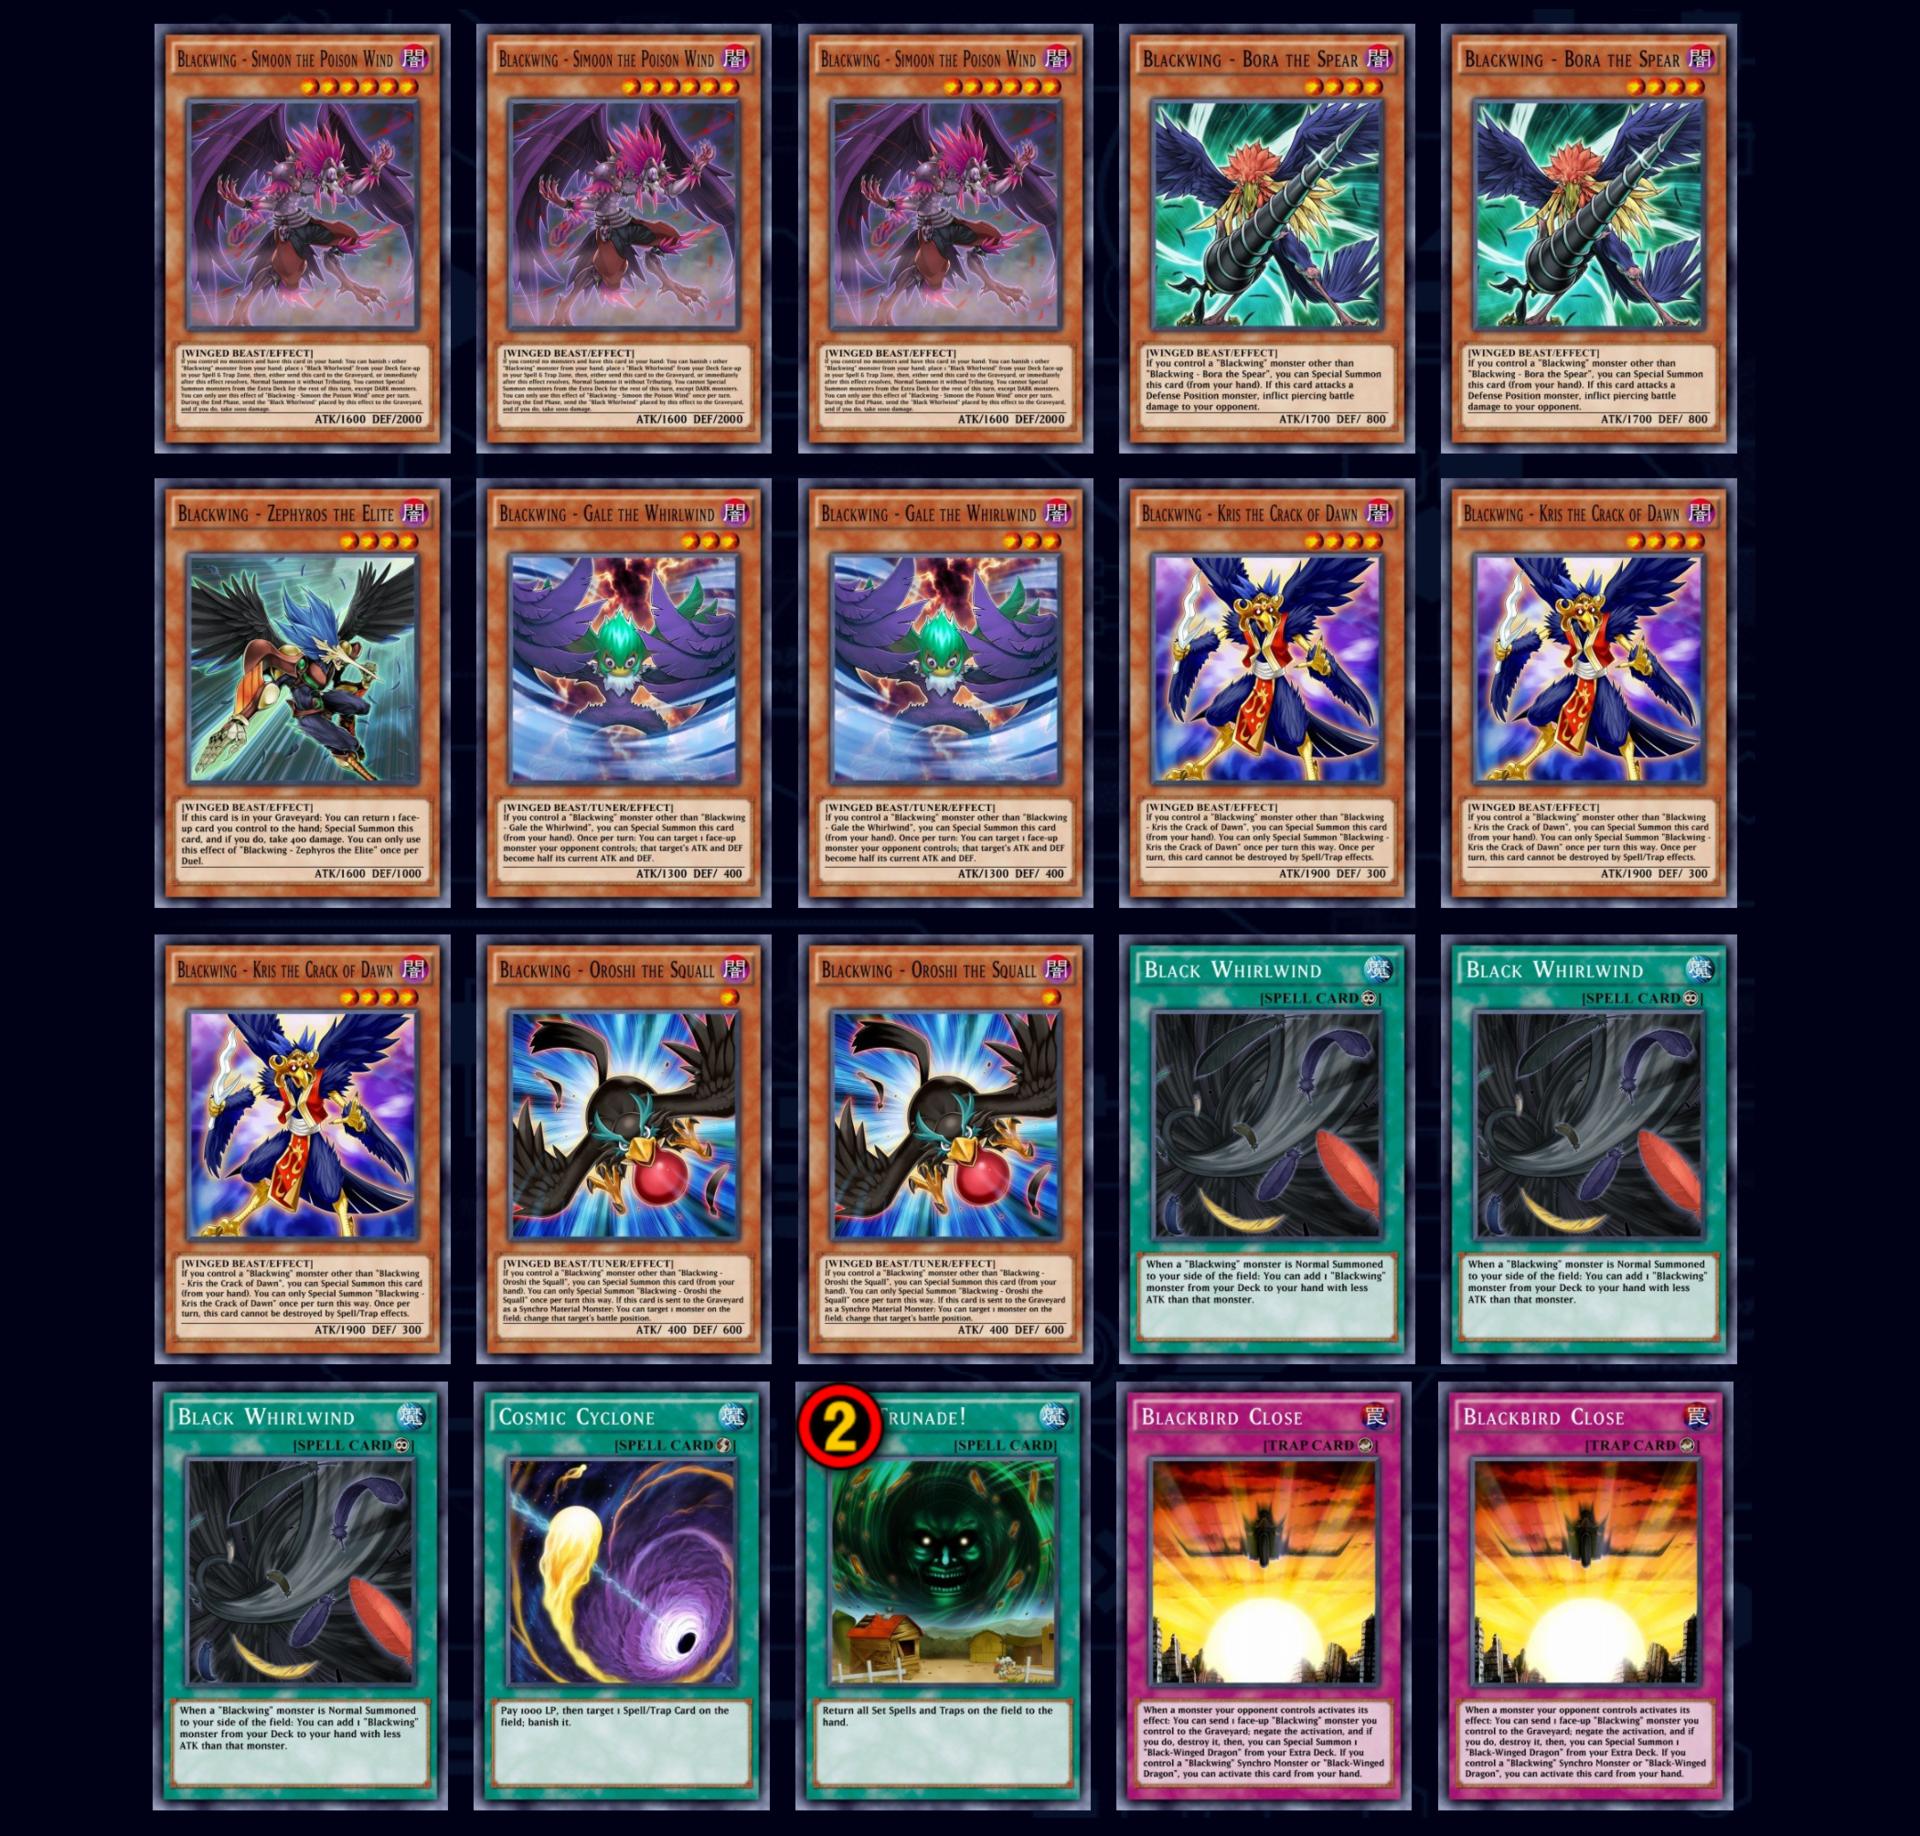 Blackwing best Duel Links decks